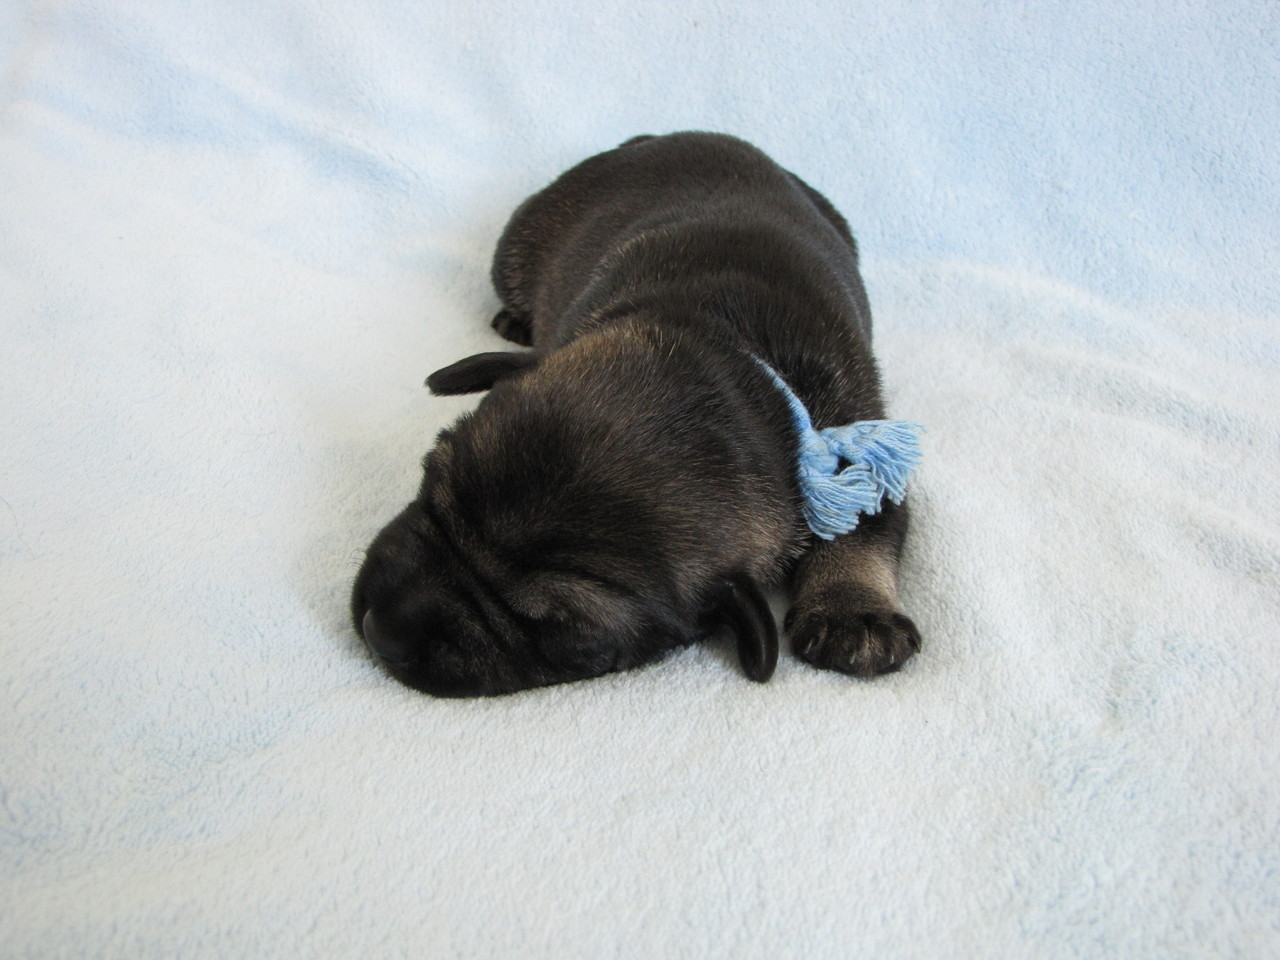 Rüde mit blauem Band